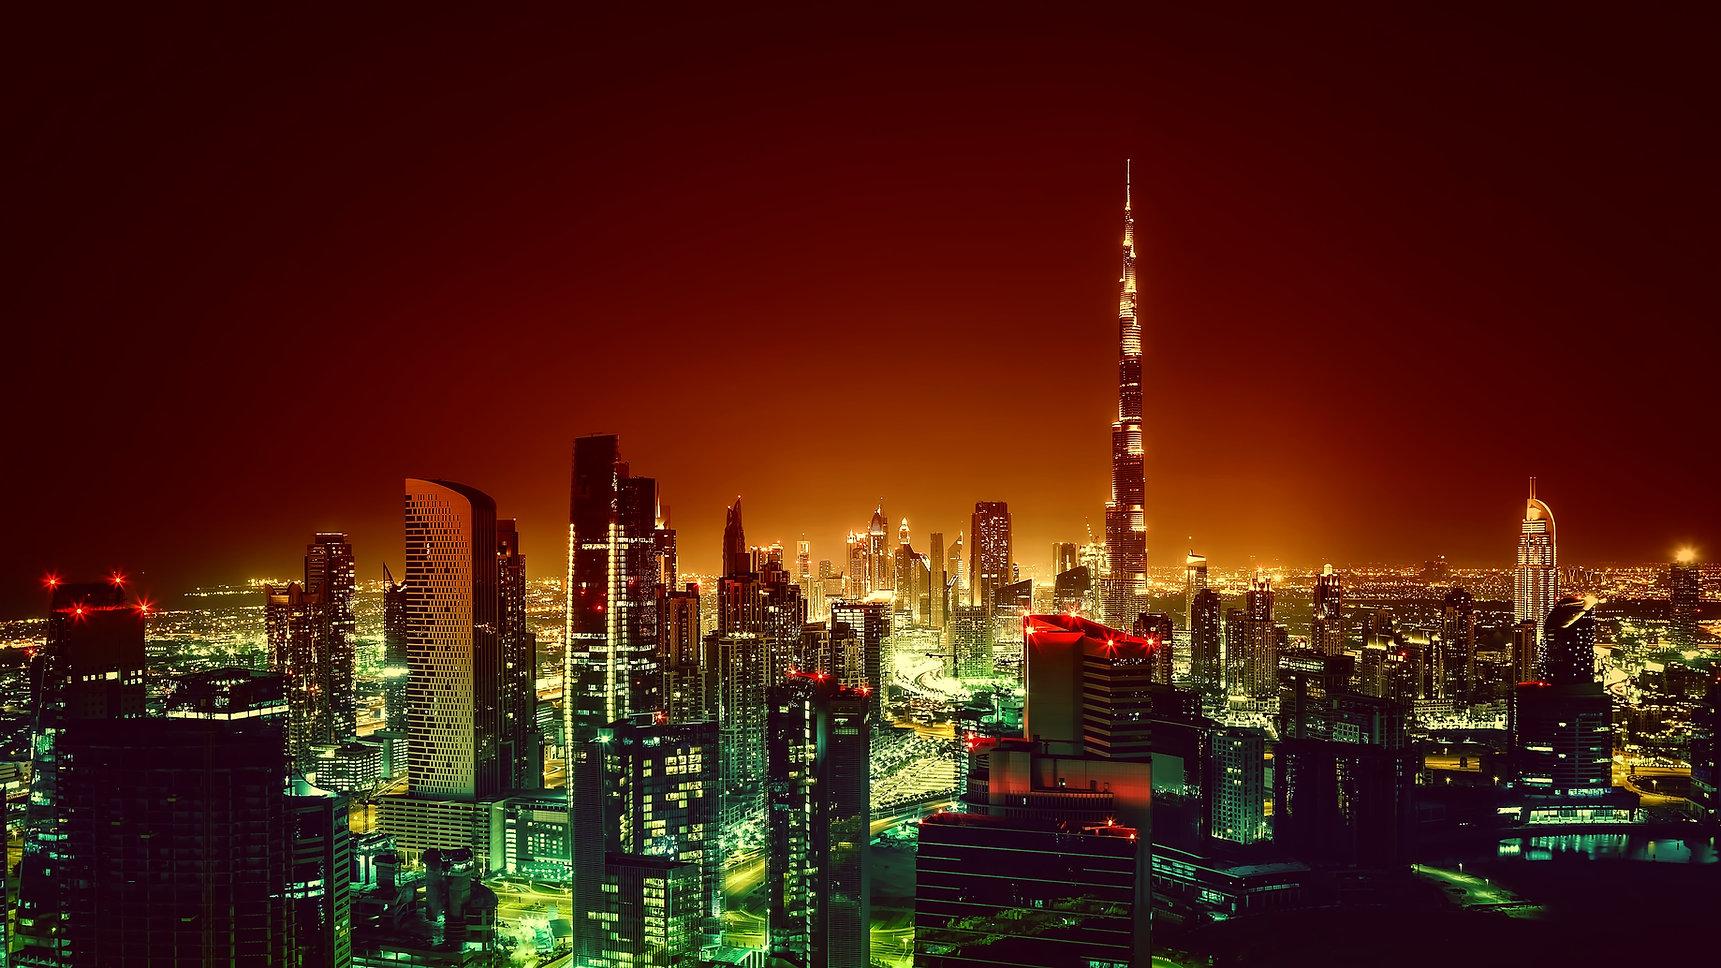 burj-khalifa-3840x2160-dubai-cityscape-n